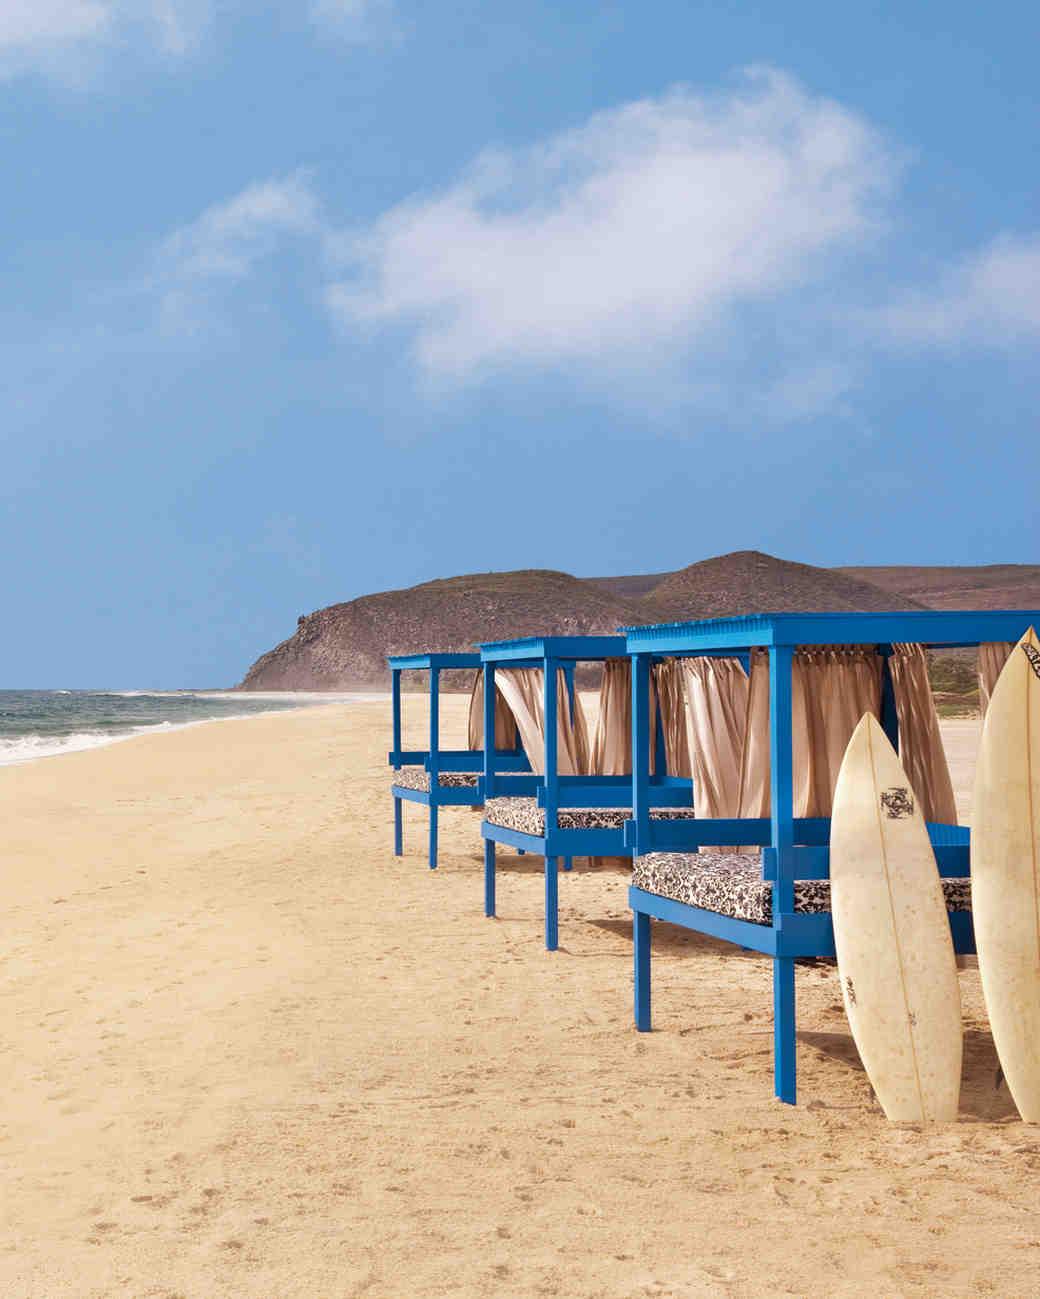 beach-bunkers-mwds109229.jpg